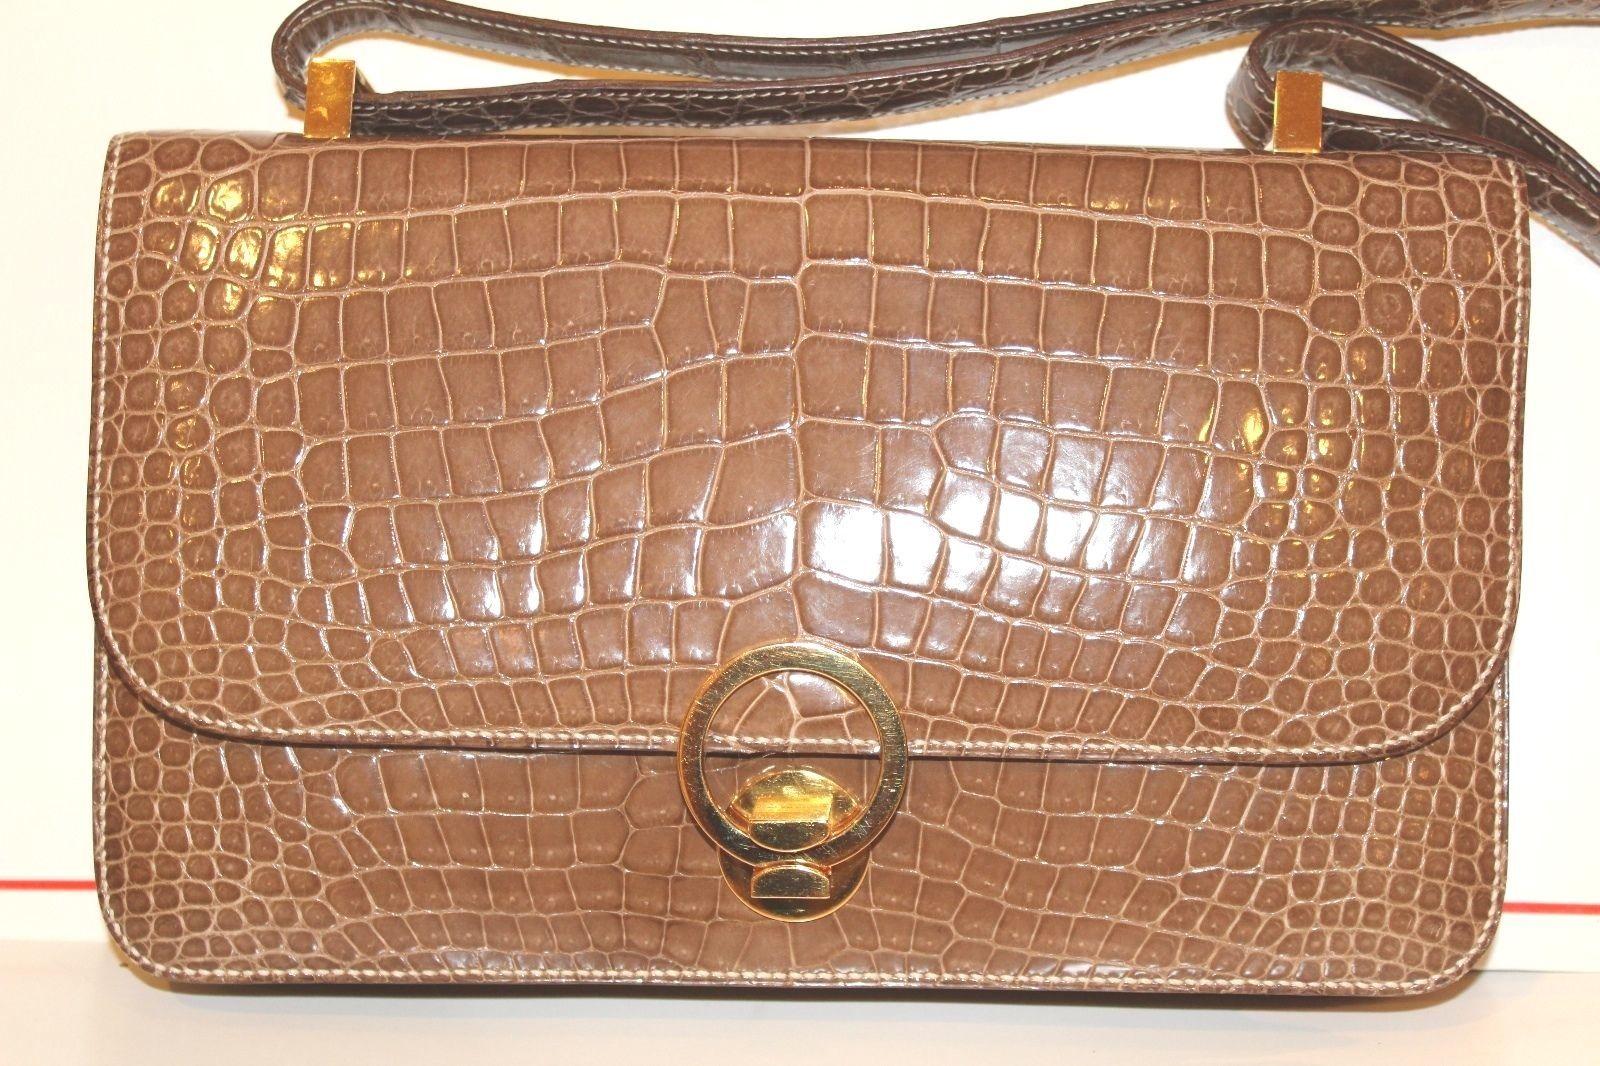 Vintage Hermes  Alligator Crocodile  Handbag Purse clutch image 6